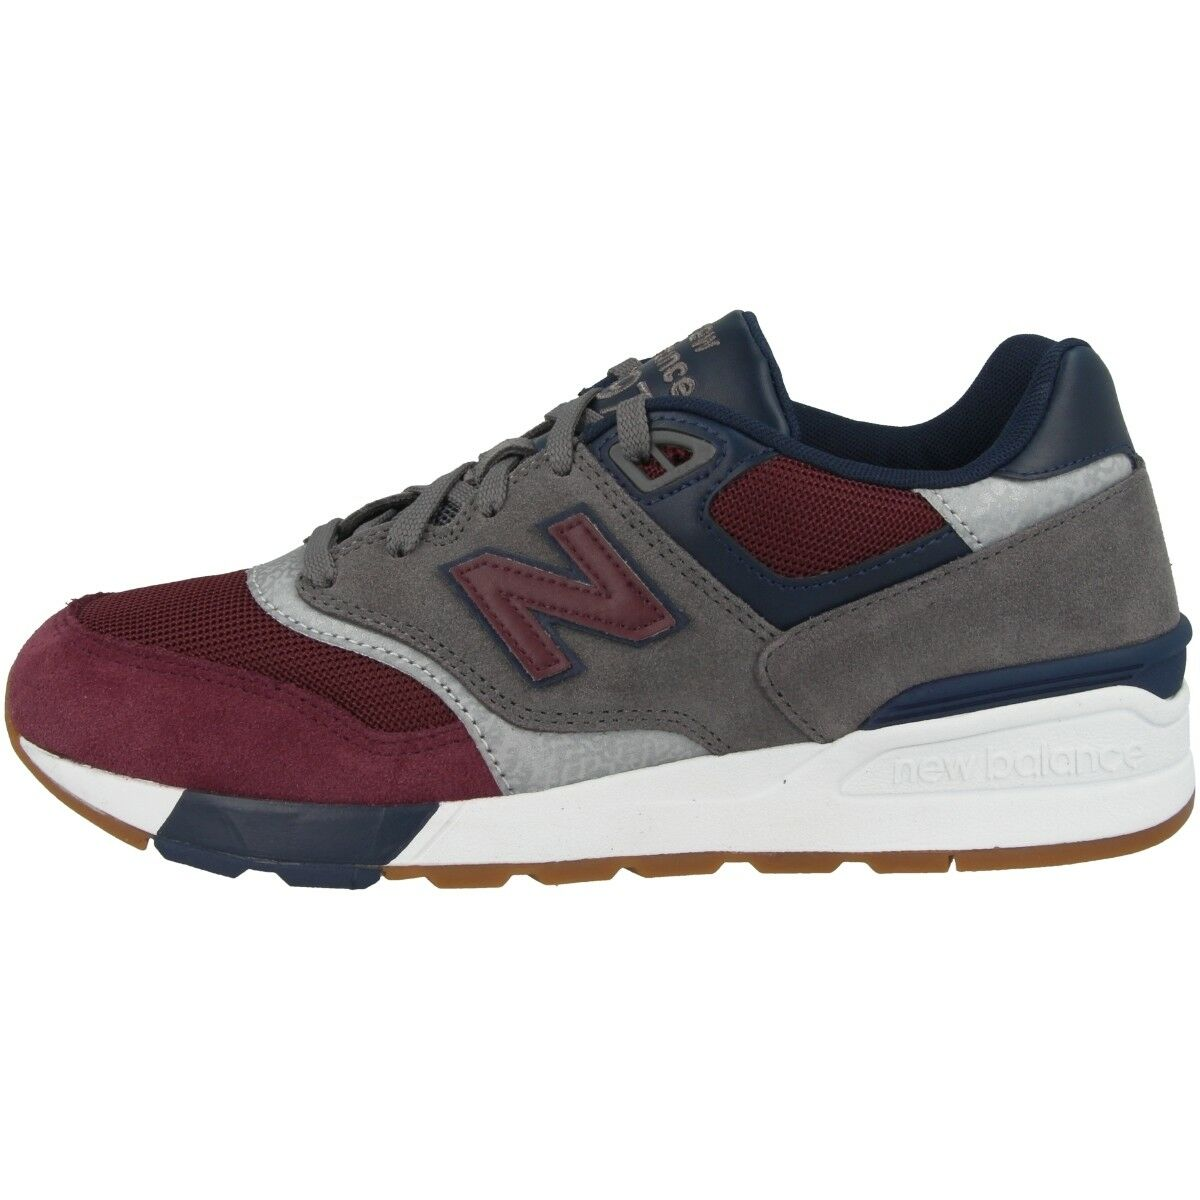 NEW Balance ML 597 BGN Scarpe Tempo Libero scarpe da ginnastica Scarpe da ginnastica grigio rosso ml597bgn | Stravagante  | Uomo/Donne Scarpa